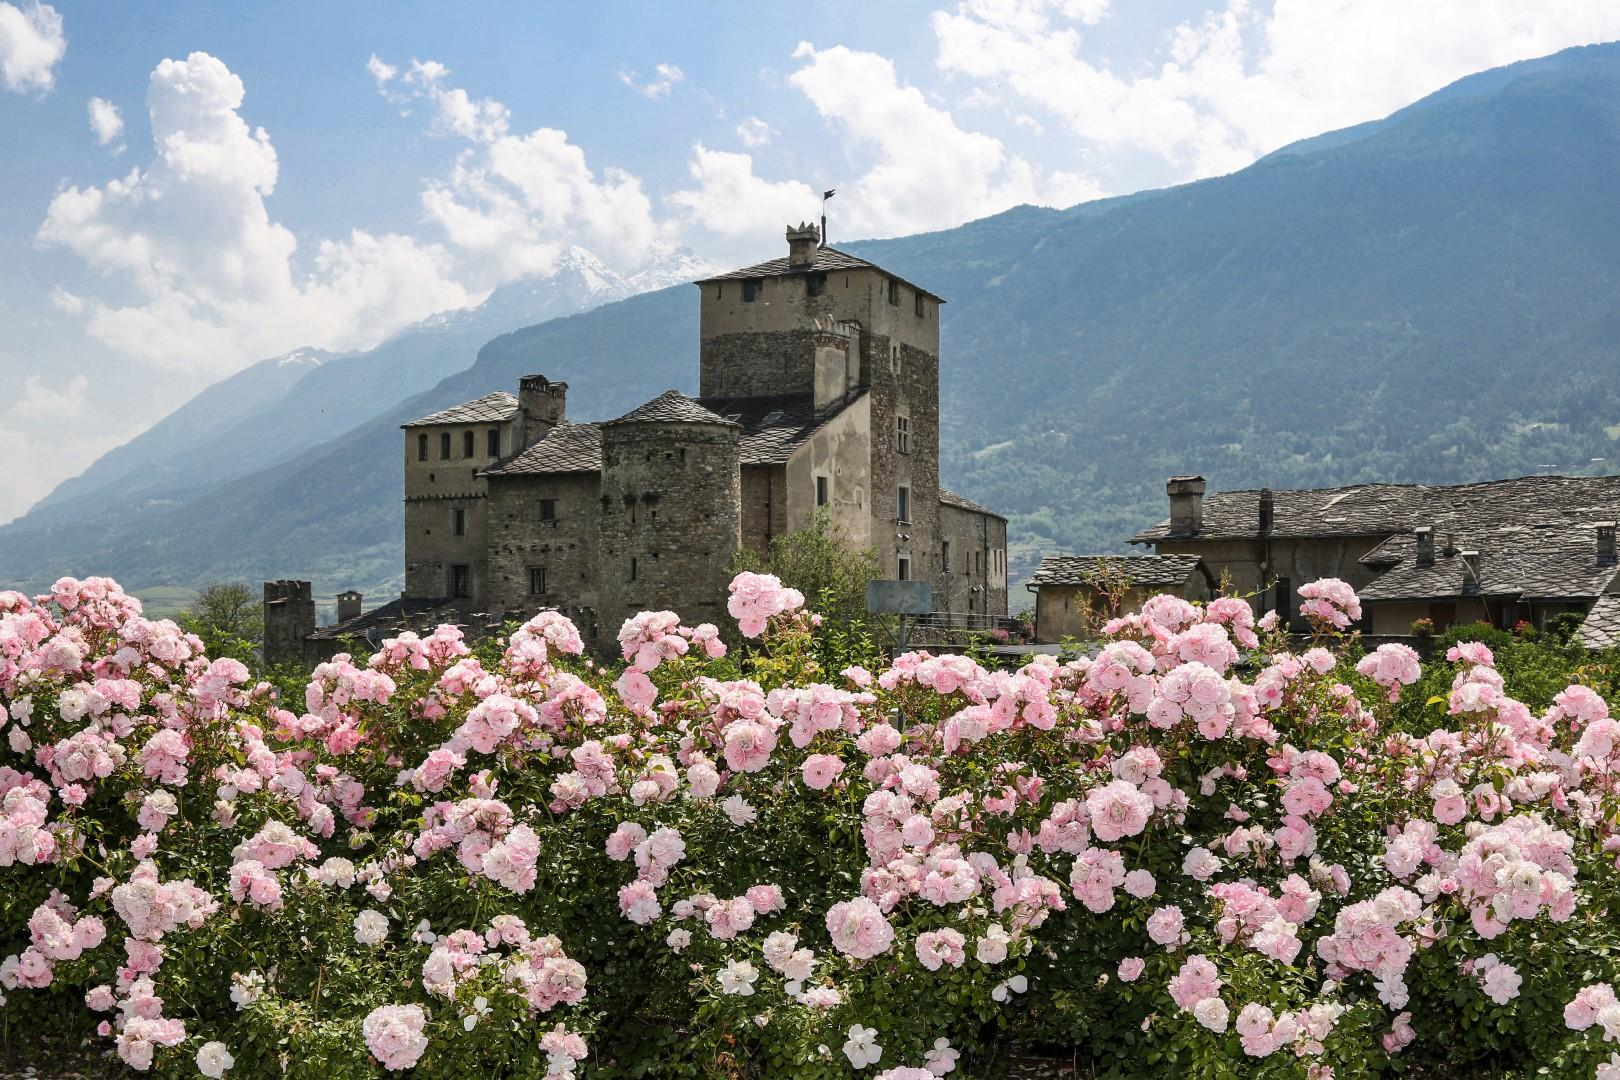 D'aostaTra Tgcom24 E Incantevole Sapori Val Castelli Unici b76fyIvmgY